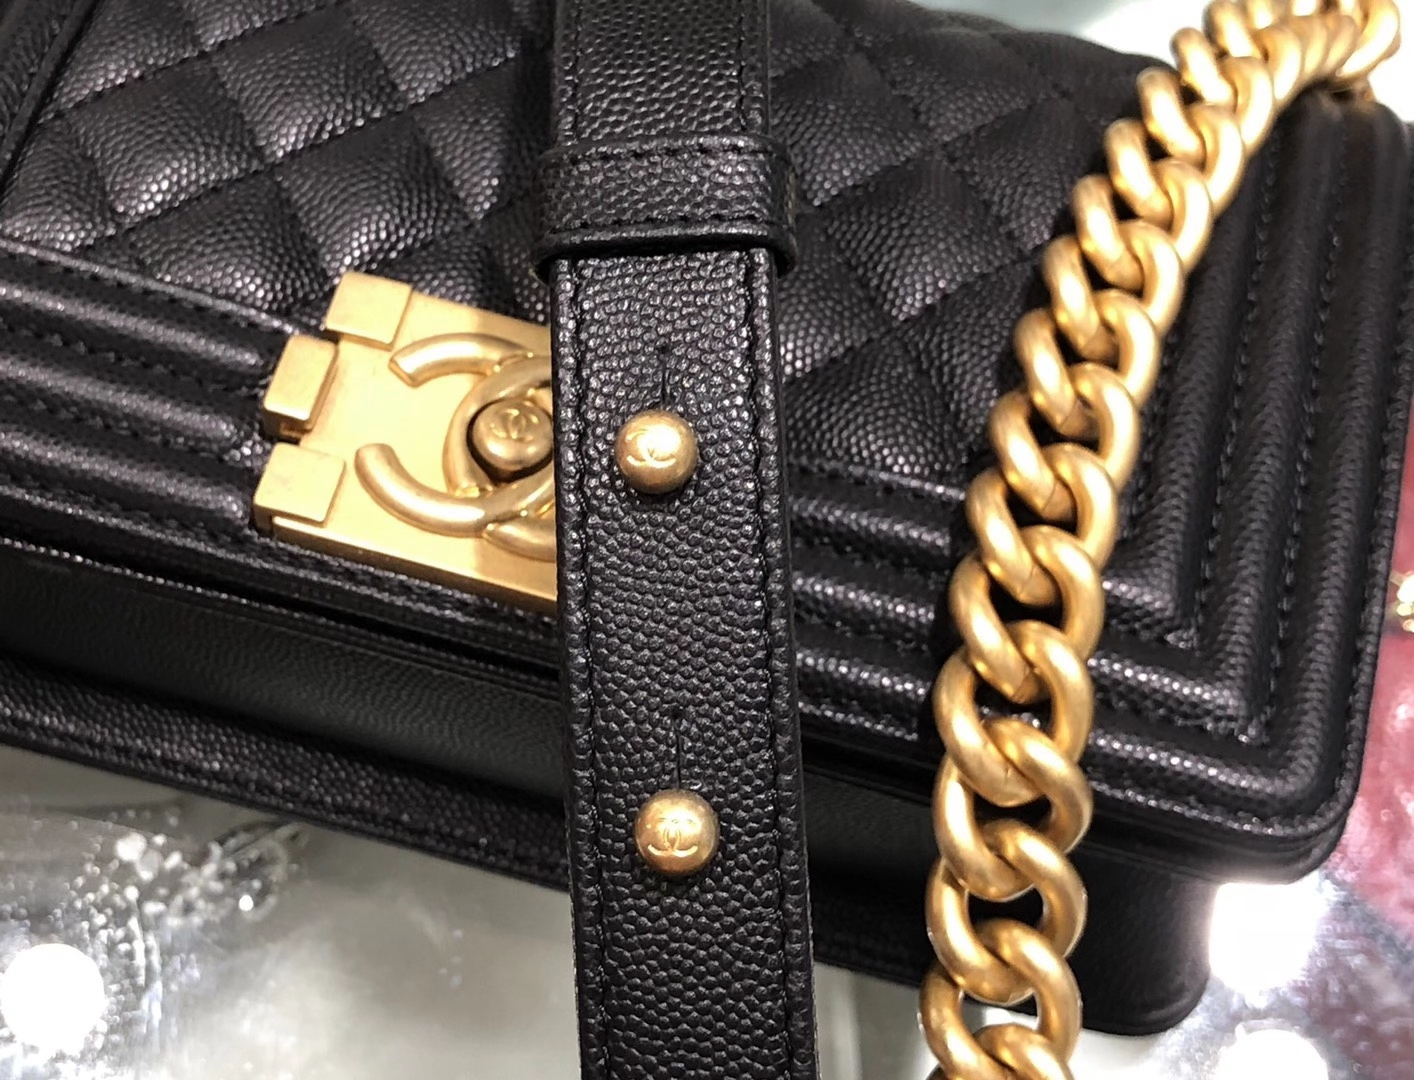 Chanel(香奈儿)Leboy 球纹皮配搭复古砂金 菱格 黑色 20cm